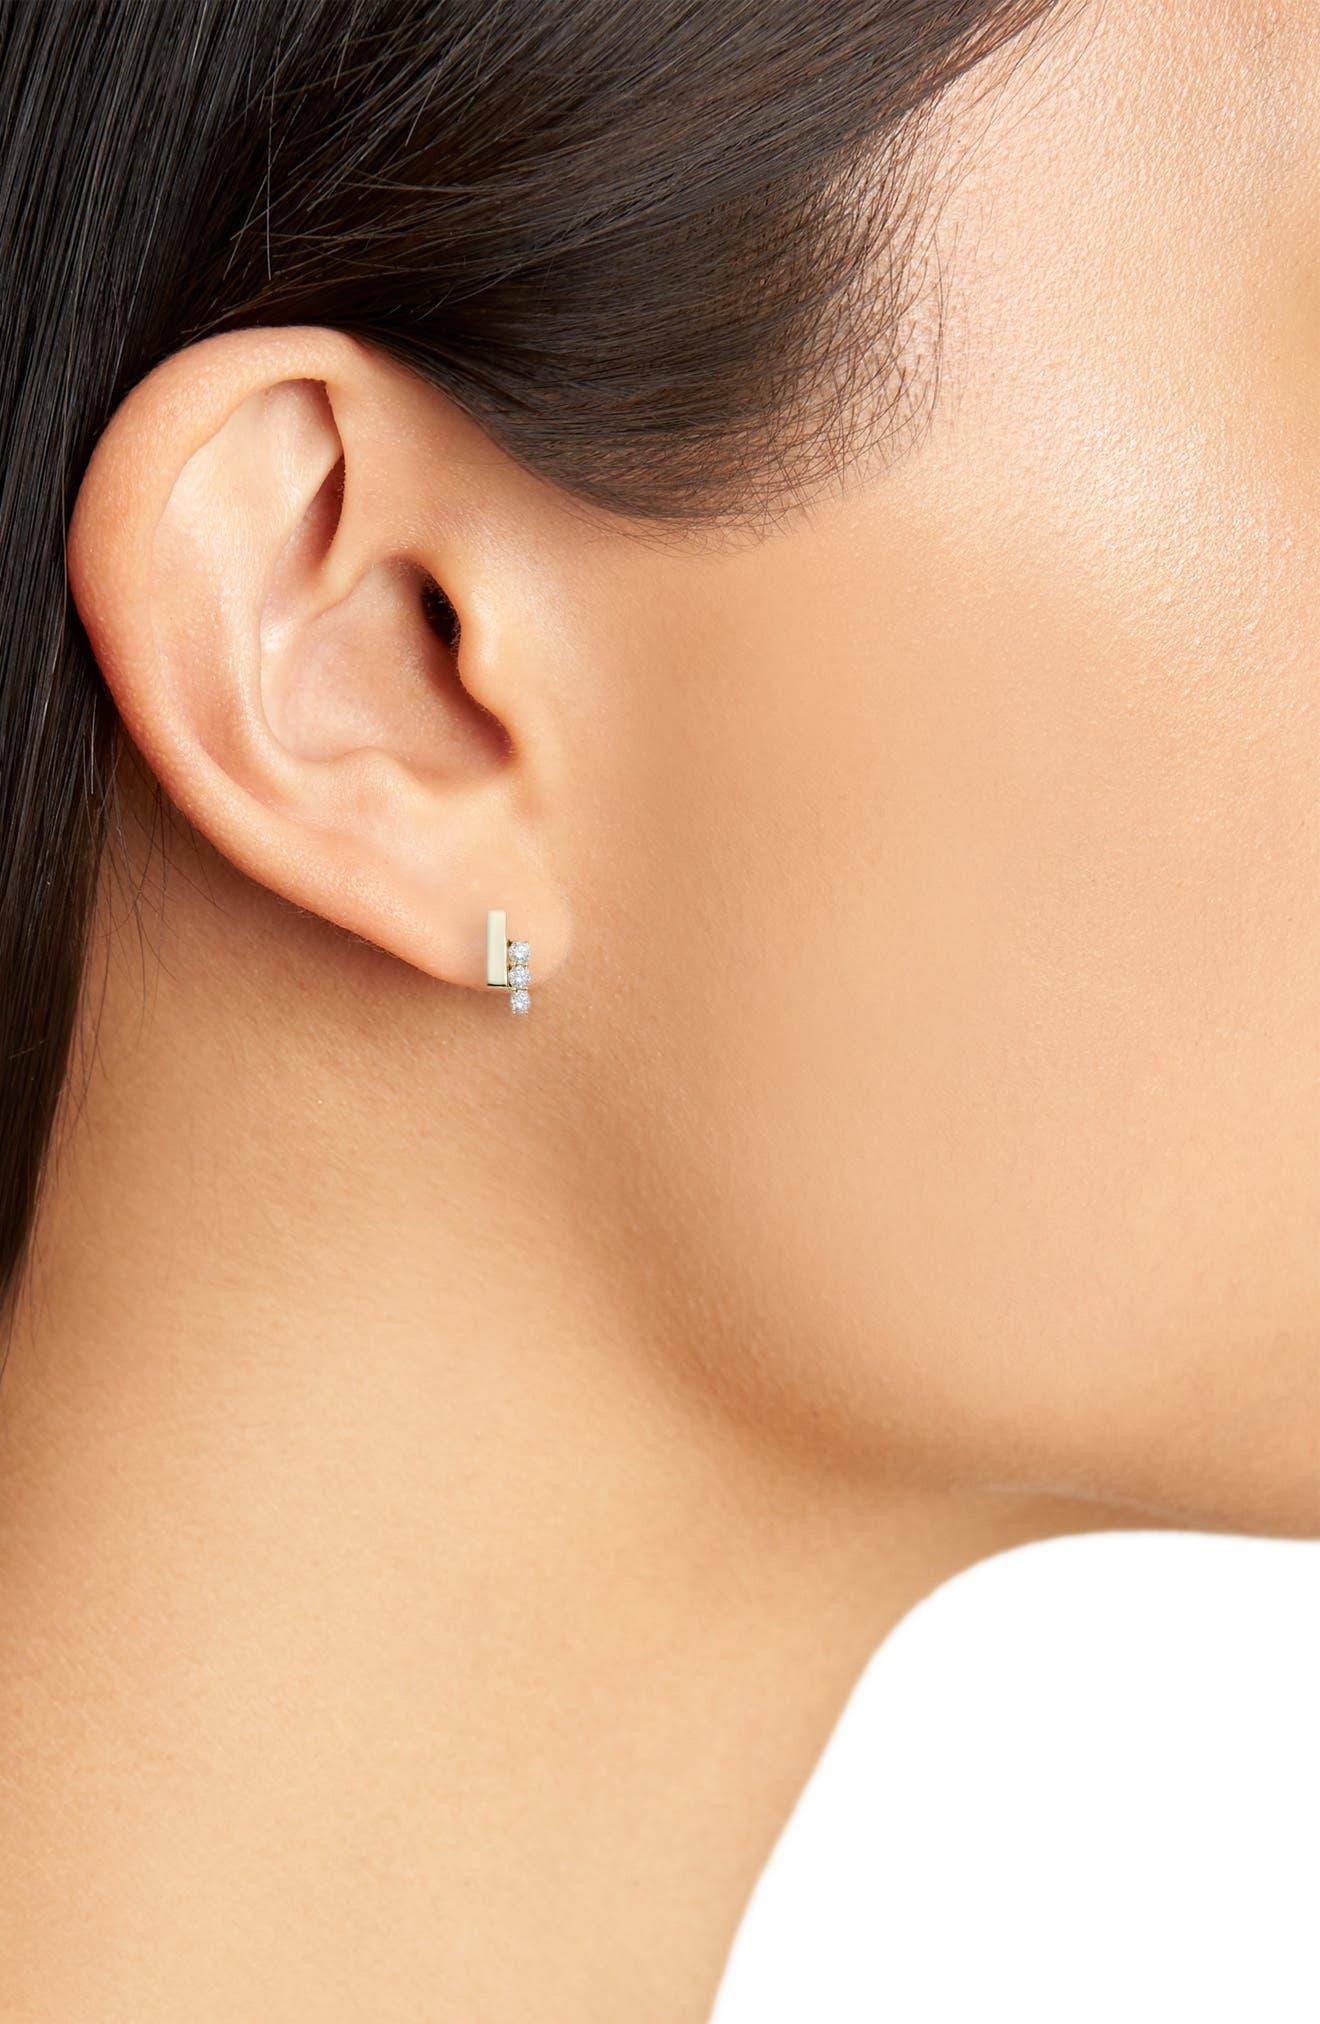 DANA REBECCA DESIGNS, Sylvie Rose Diamond Bar Stud Earrings, Alternate thumbnail 2, color, YELLOW GOLD/ DIAMOND